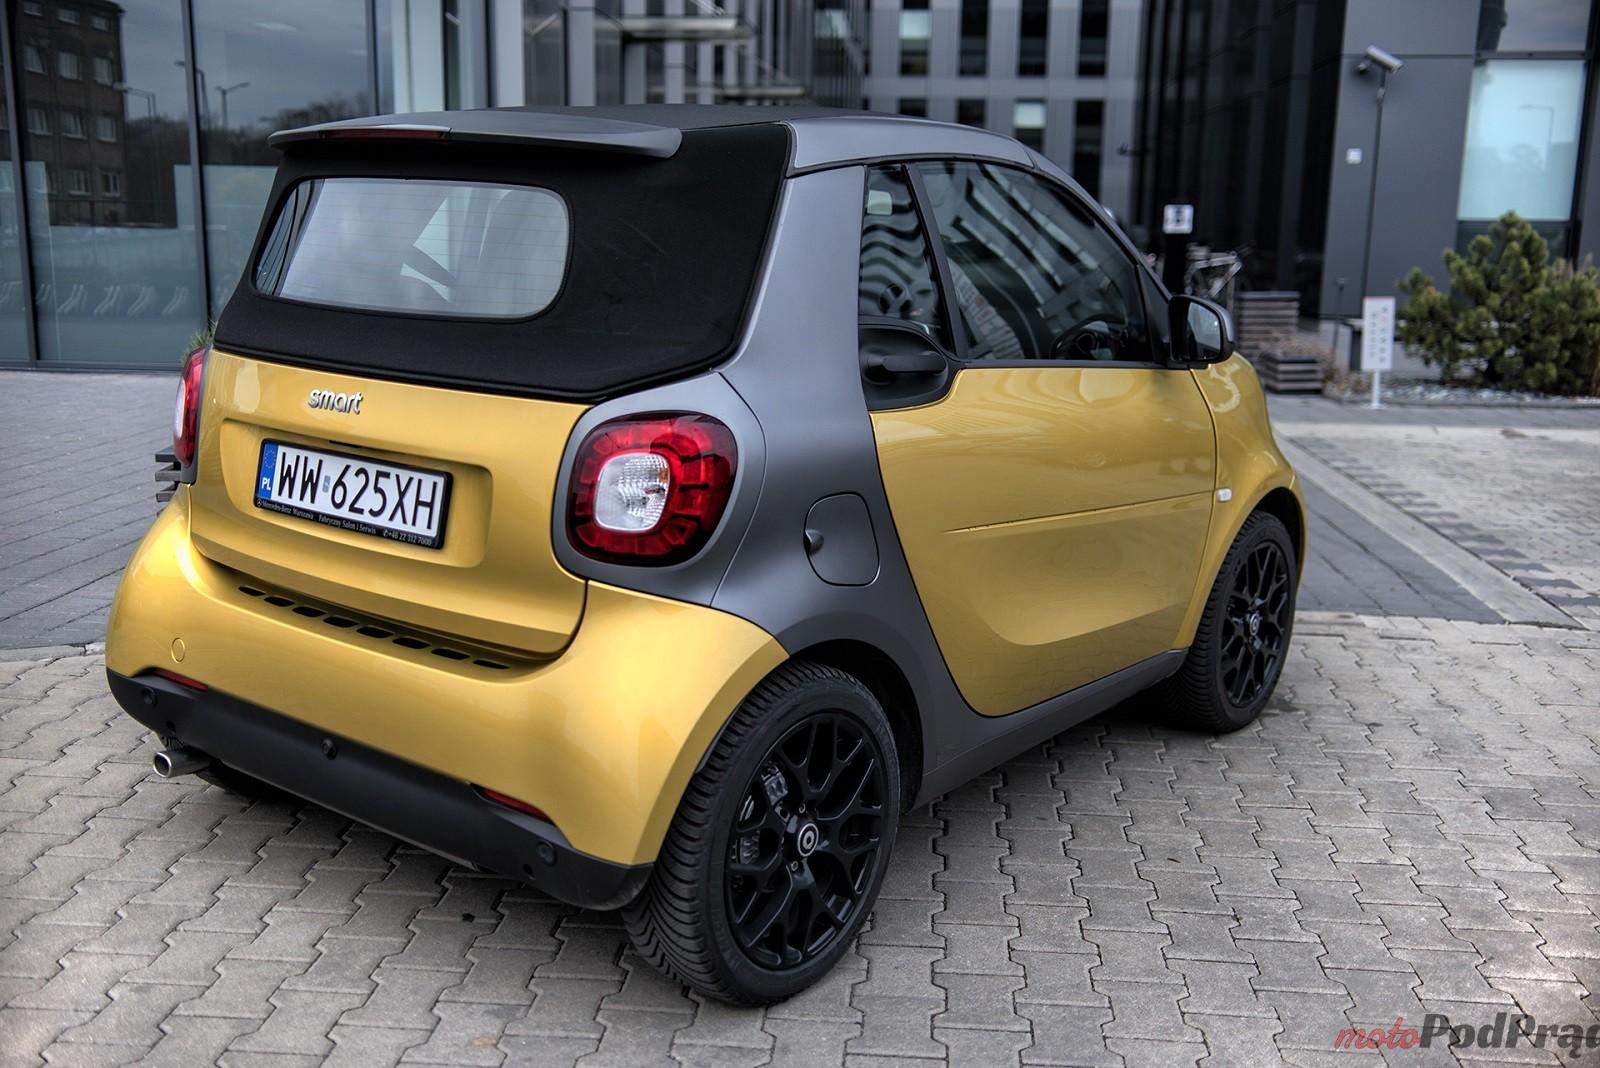 Smart ForTwo Cabrio 13 Test: Smart ForTwo Cabrio   zaskakuje na każdym kroku